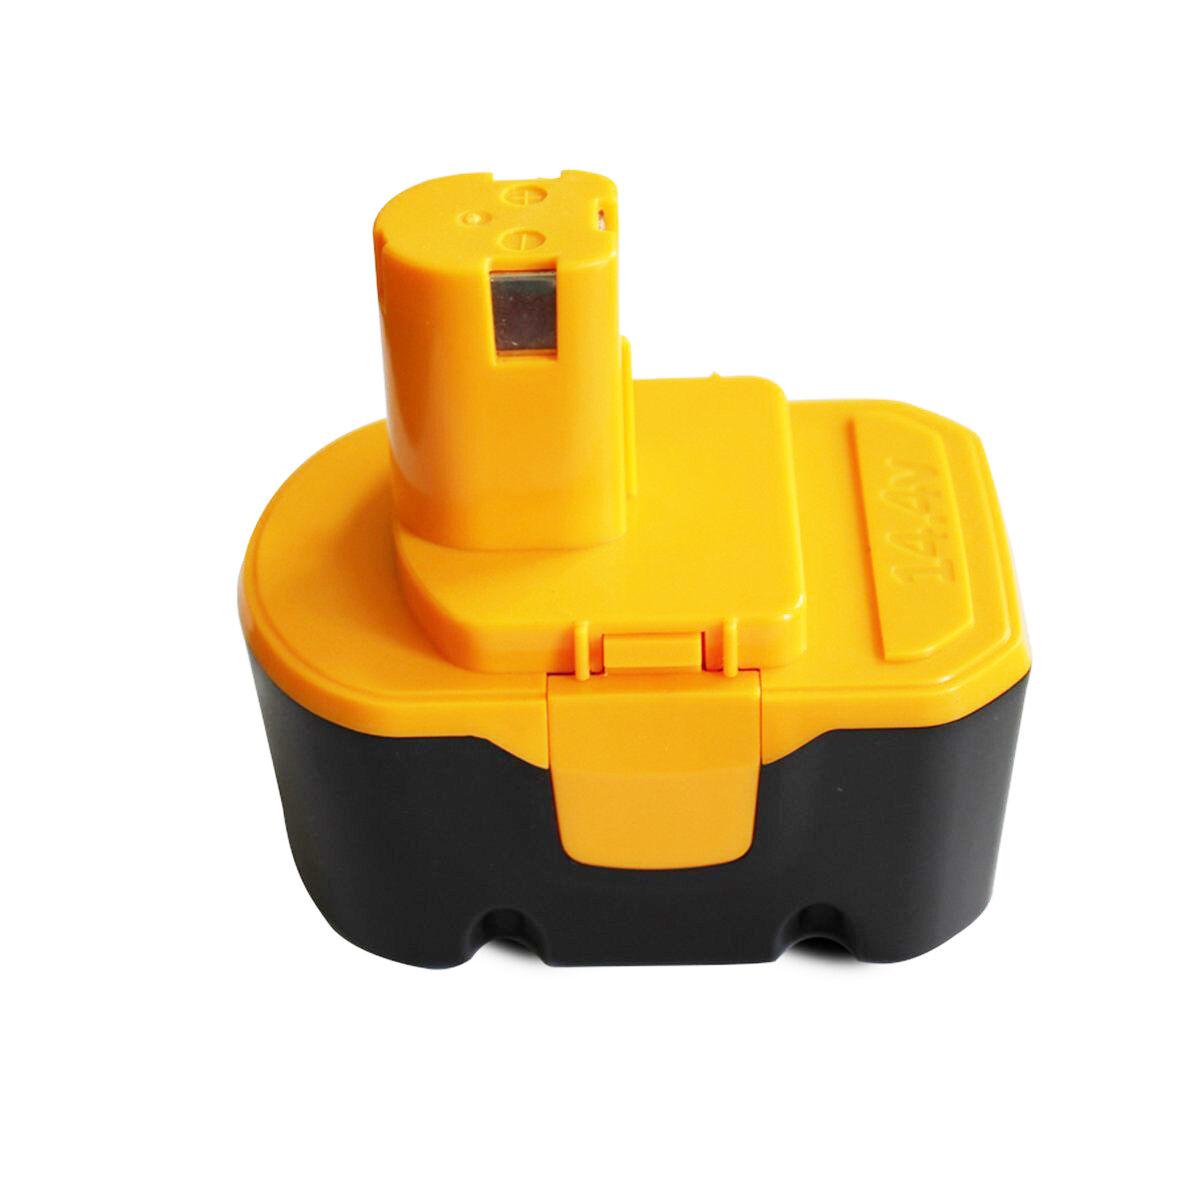 2000mah Ni-Cd 14.4V 2.0AH Replacement Battery for Ryobi Cordless Drill Tool